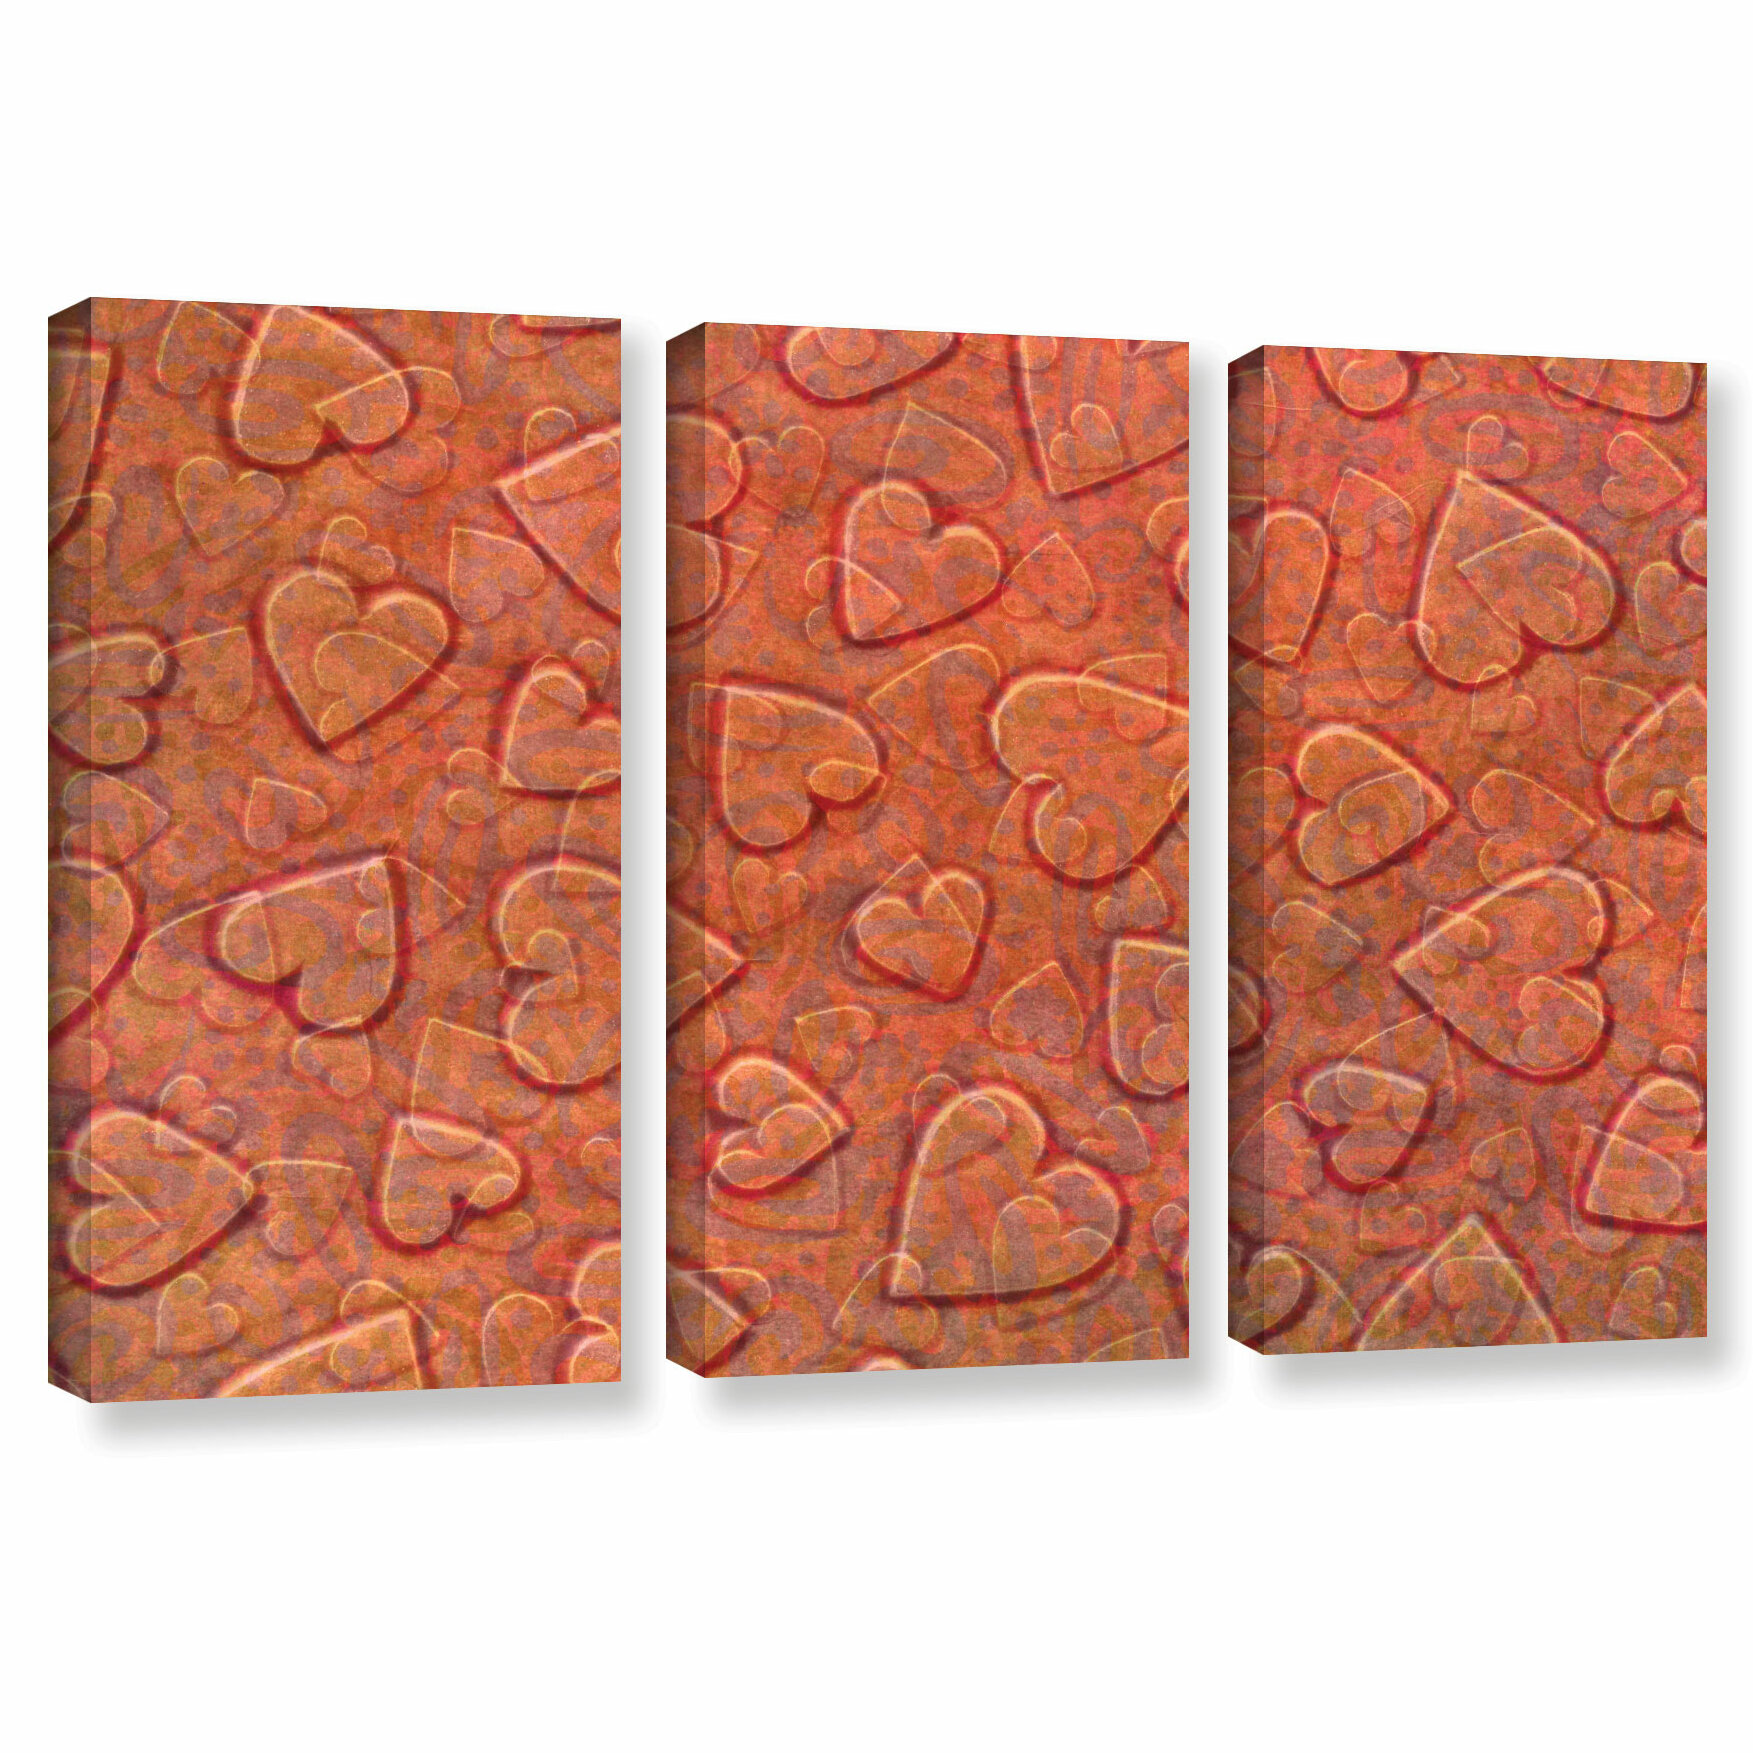 Isabelle Max Lenny Large Heart Mixed Pattern 3 Piece Canvas Art Wayfair